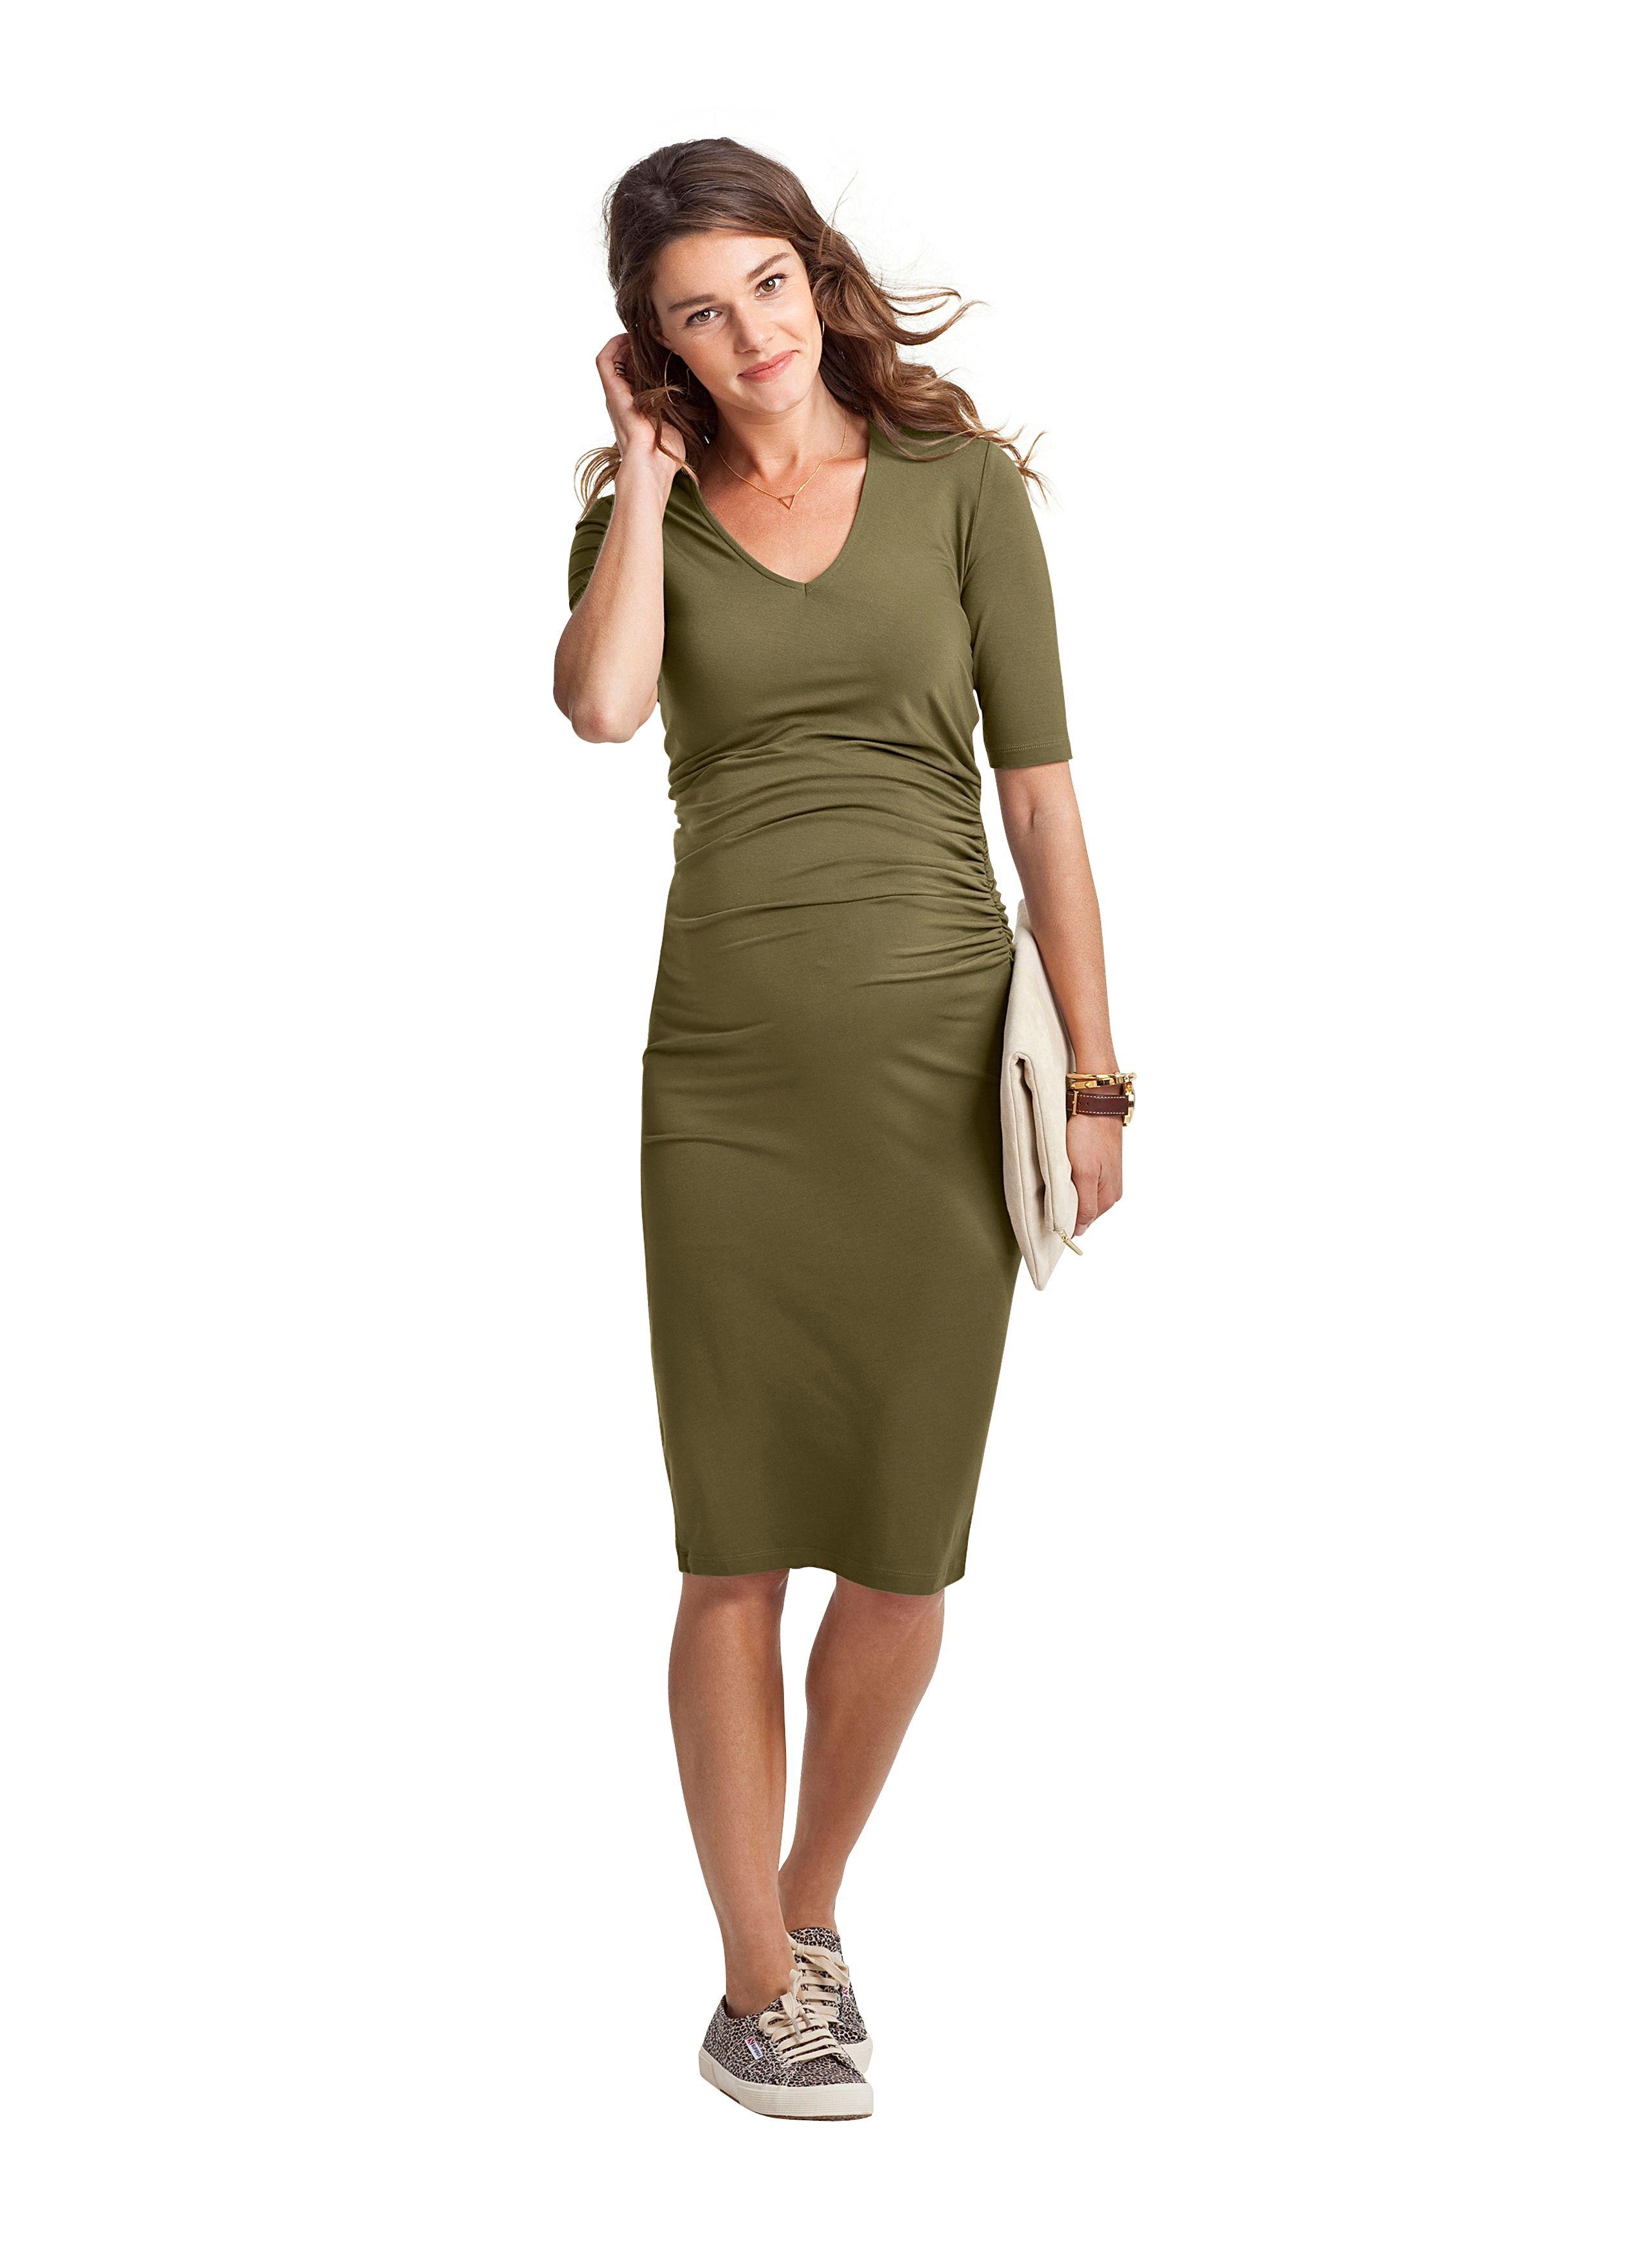 Arran maternity dress maternity dresses arran maternity dress ombrellifo Image collections